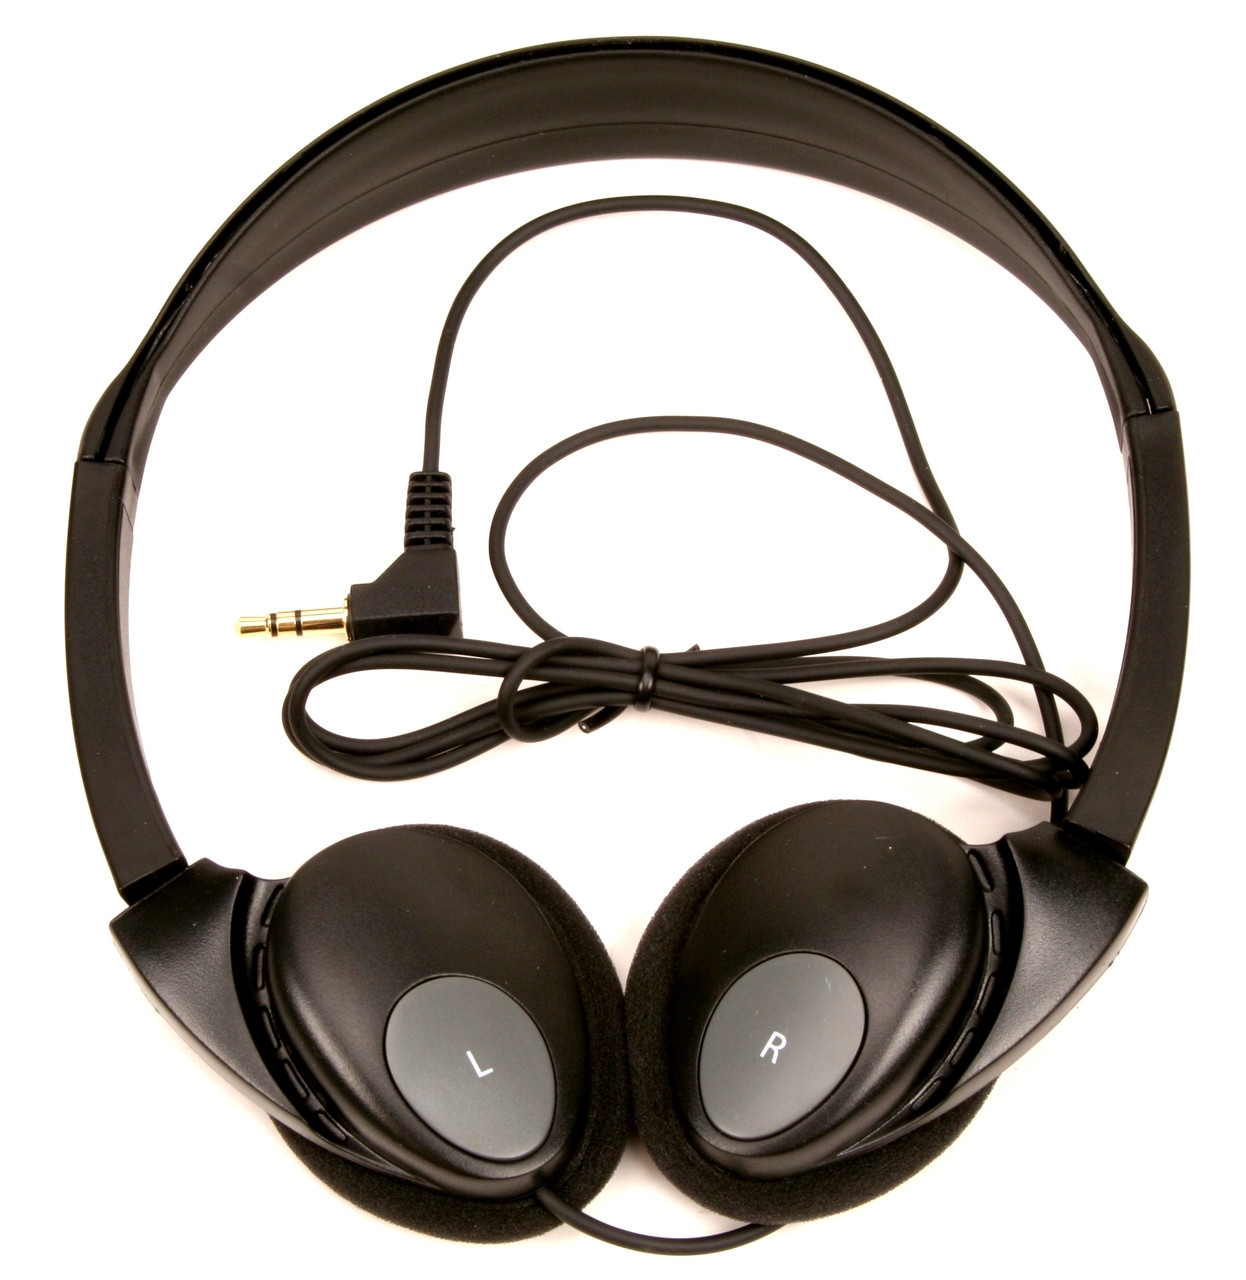 Sempre Mini Kit - Upgraded Headphones